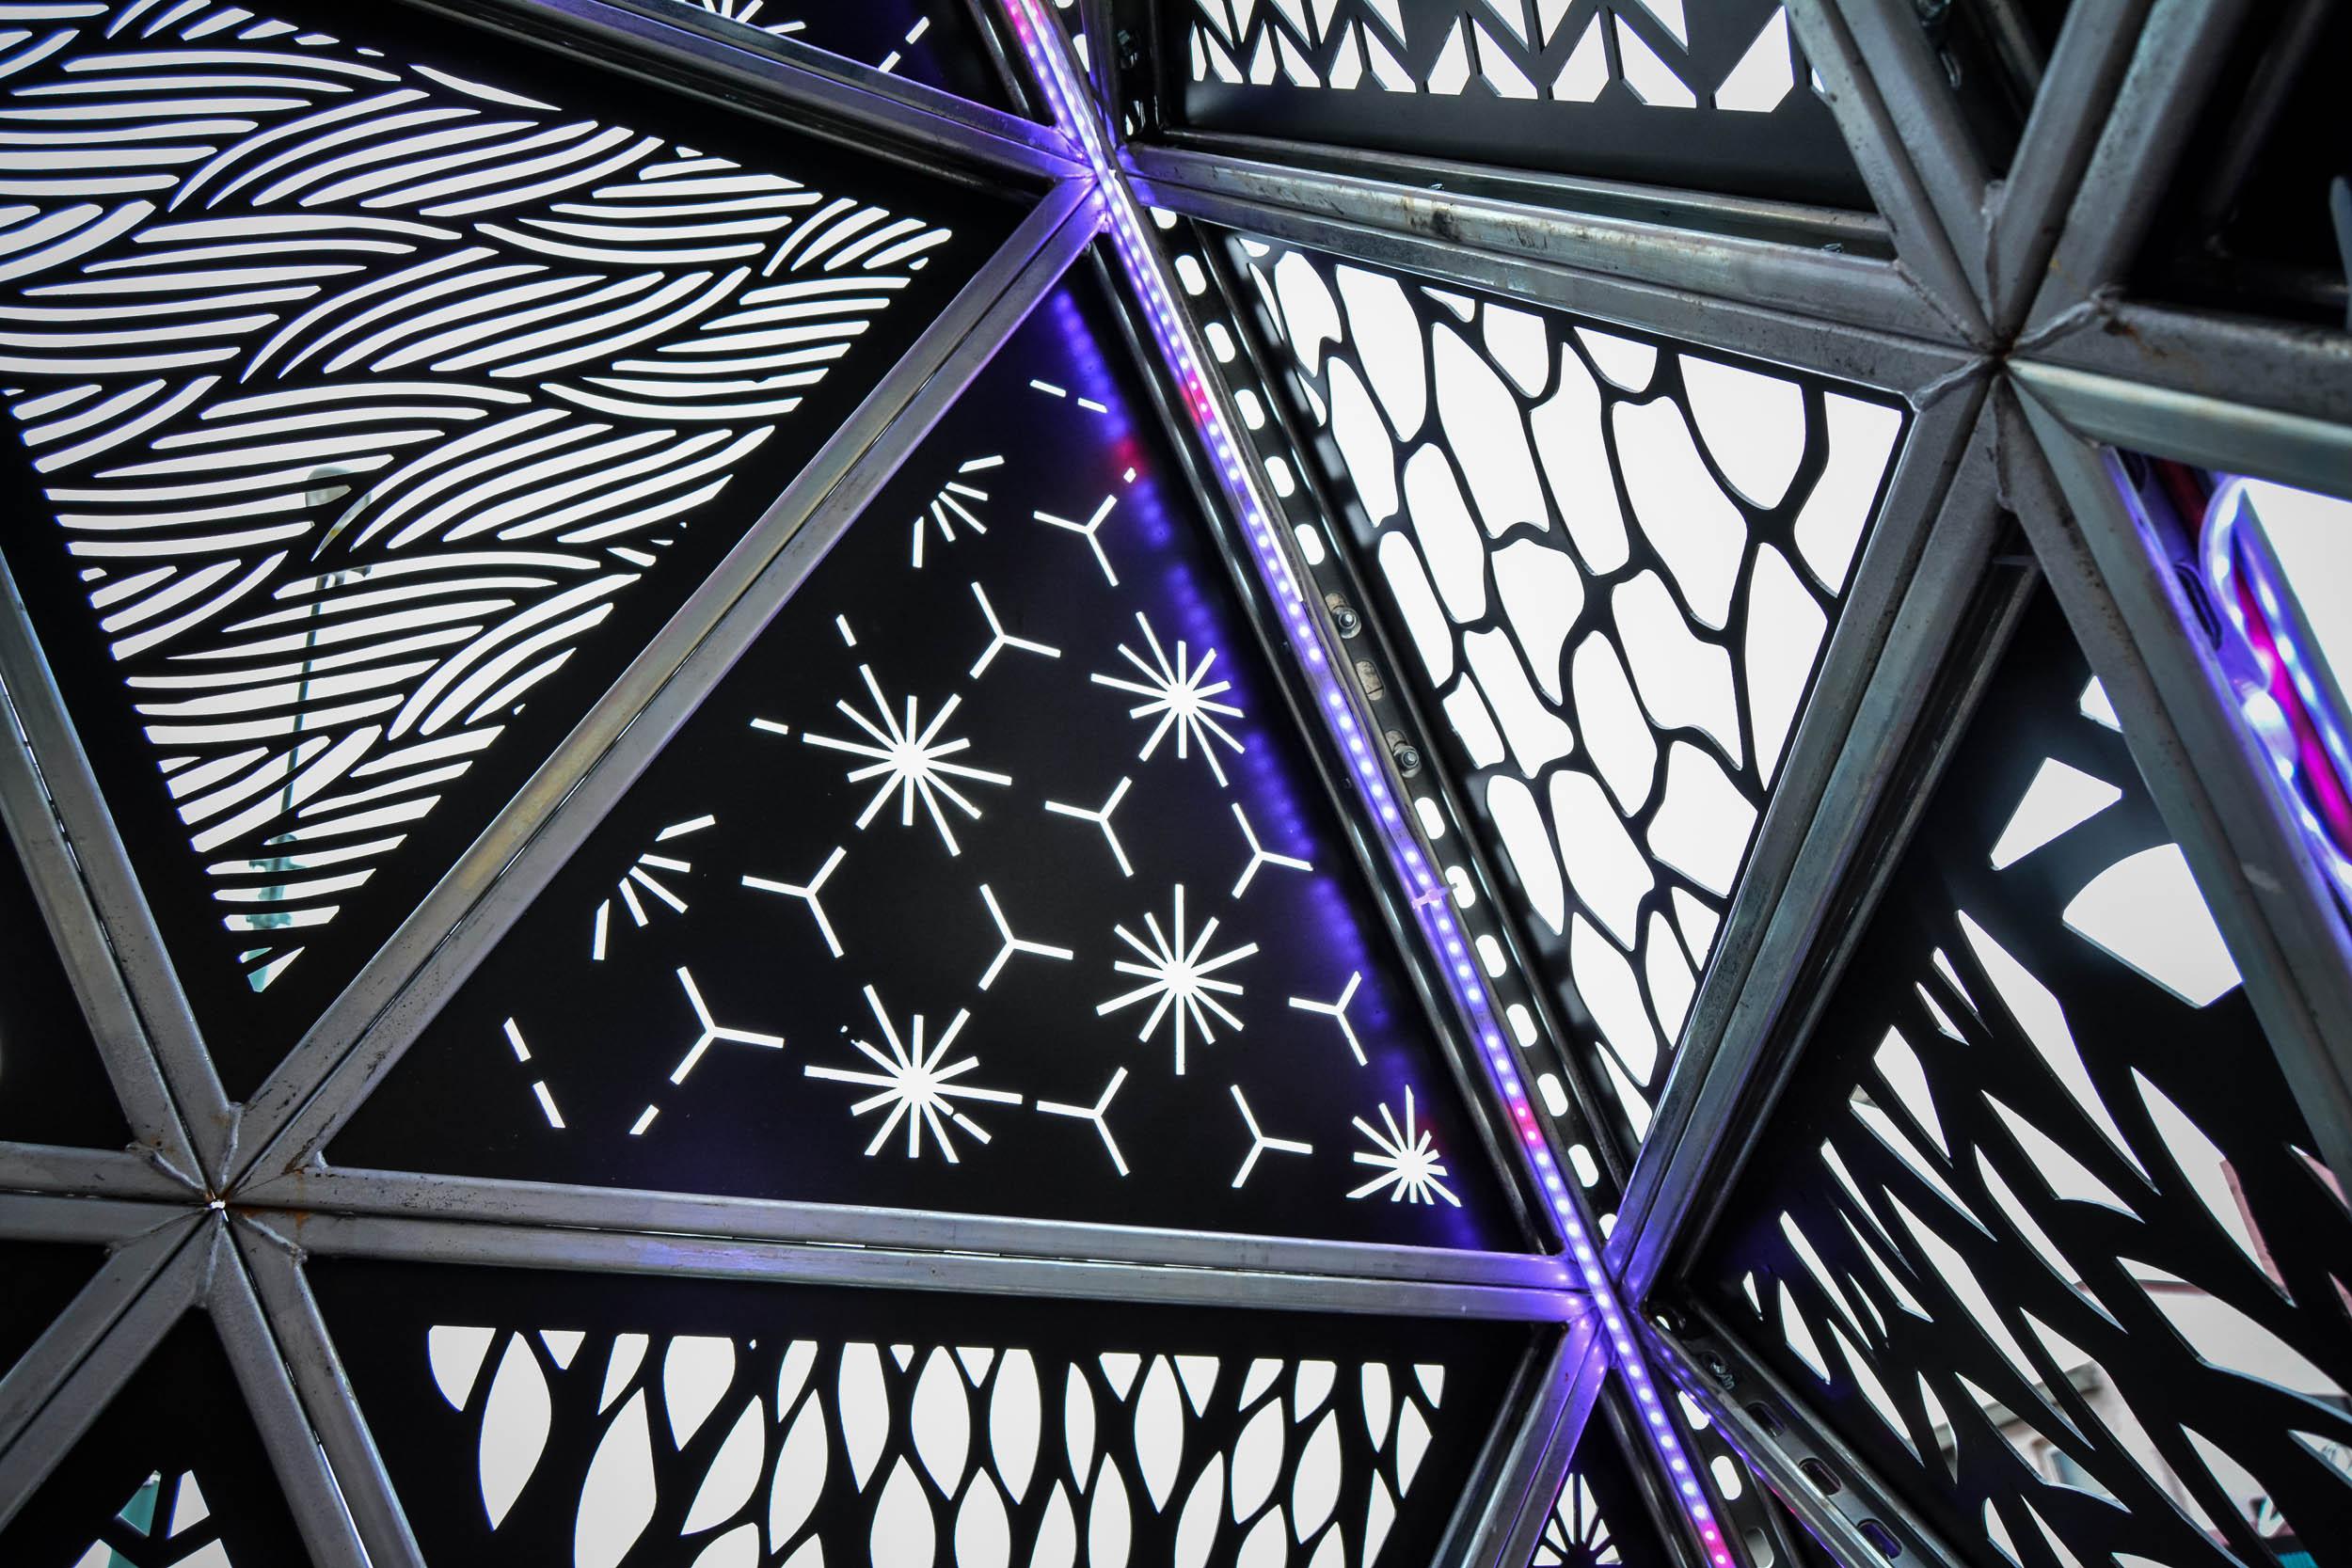 MOD 1 Tetrahedron by Christopher Reyes - Memphis Art